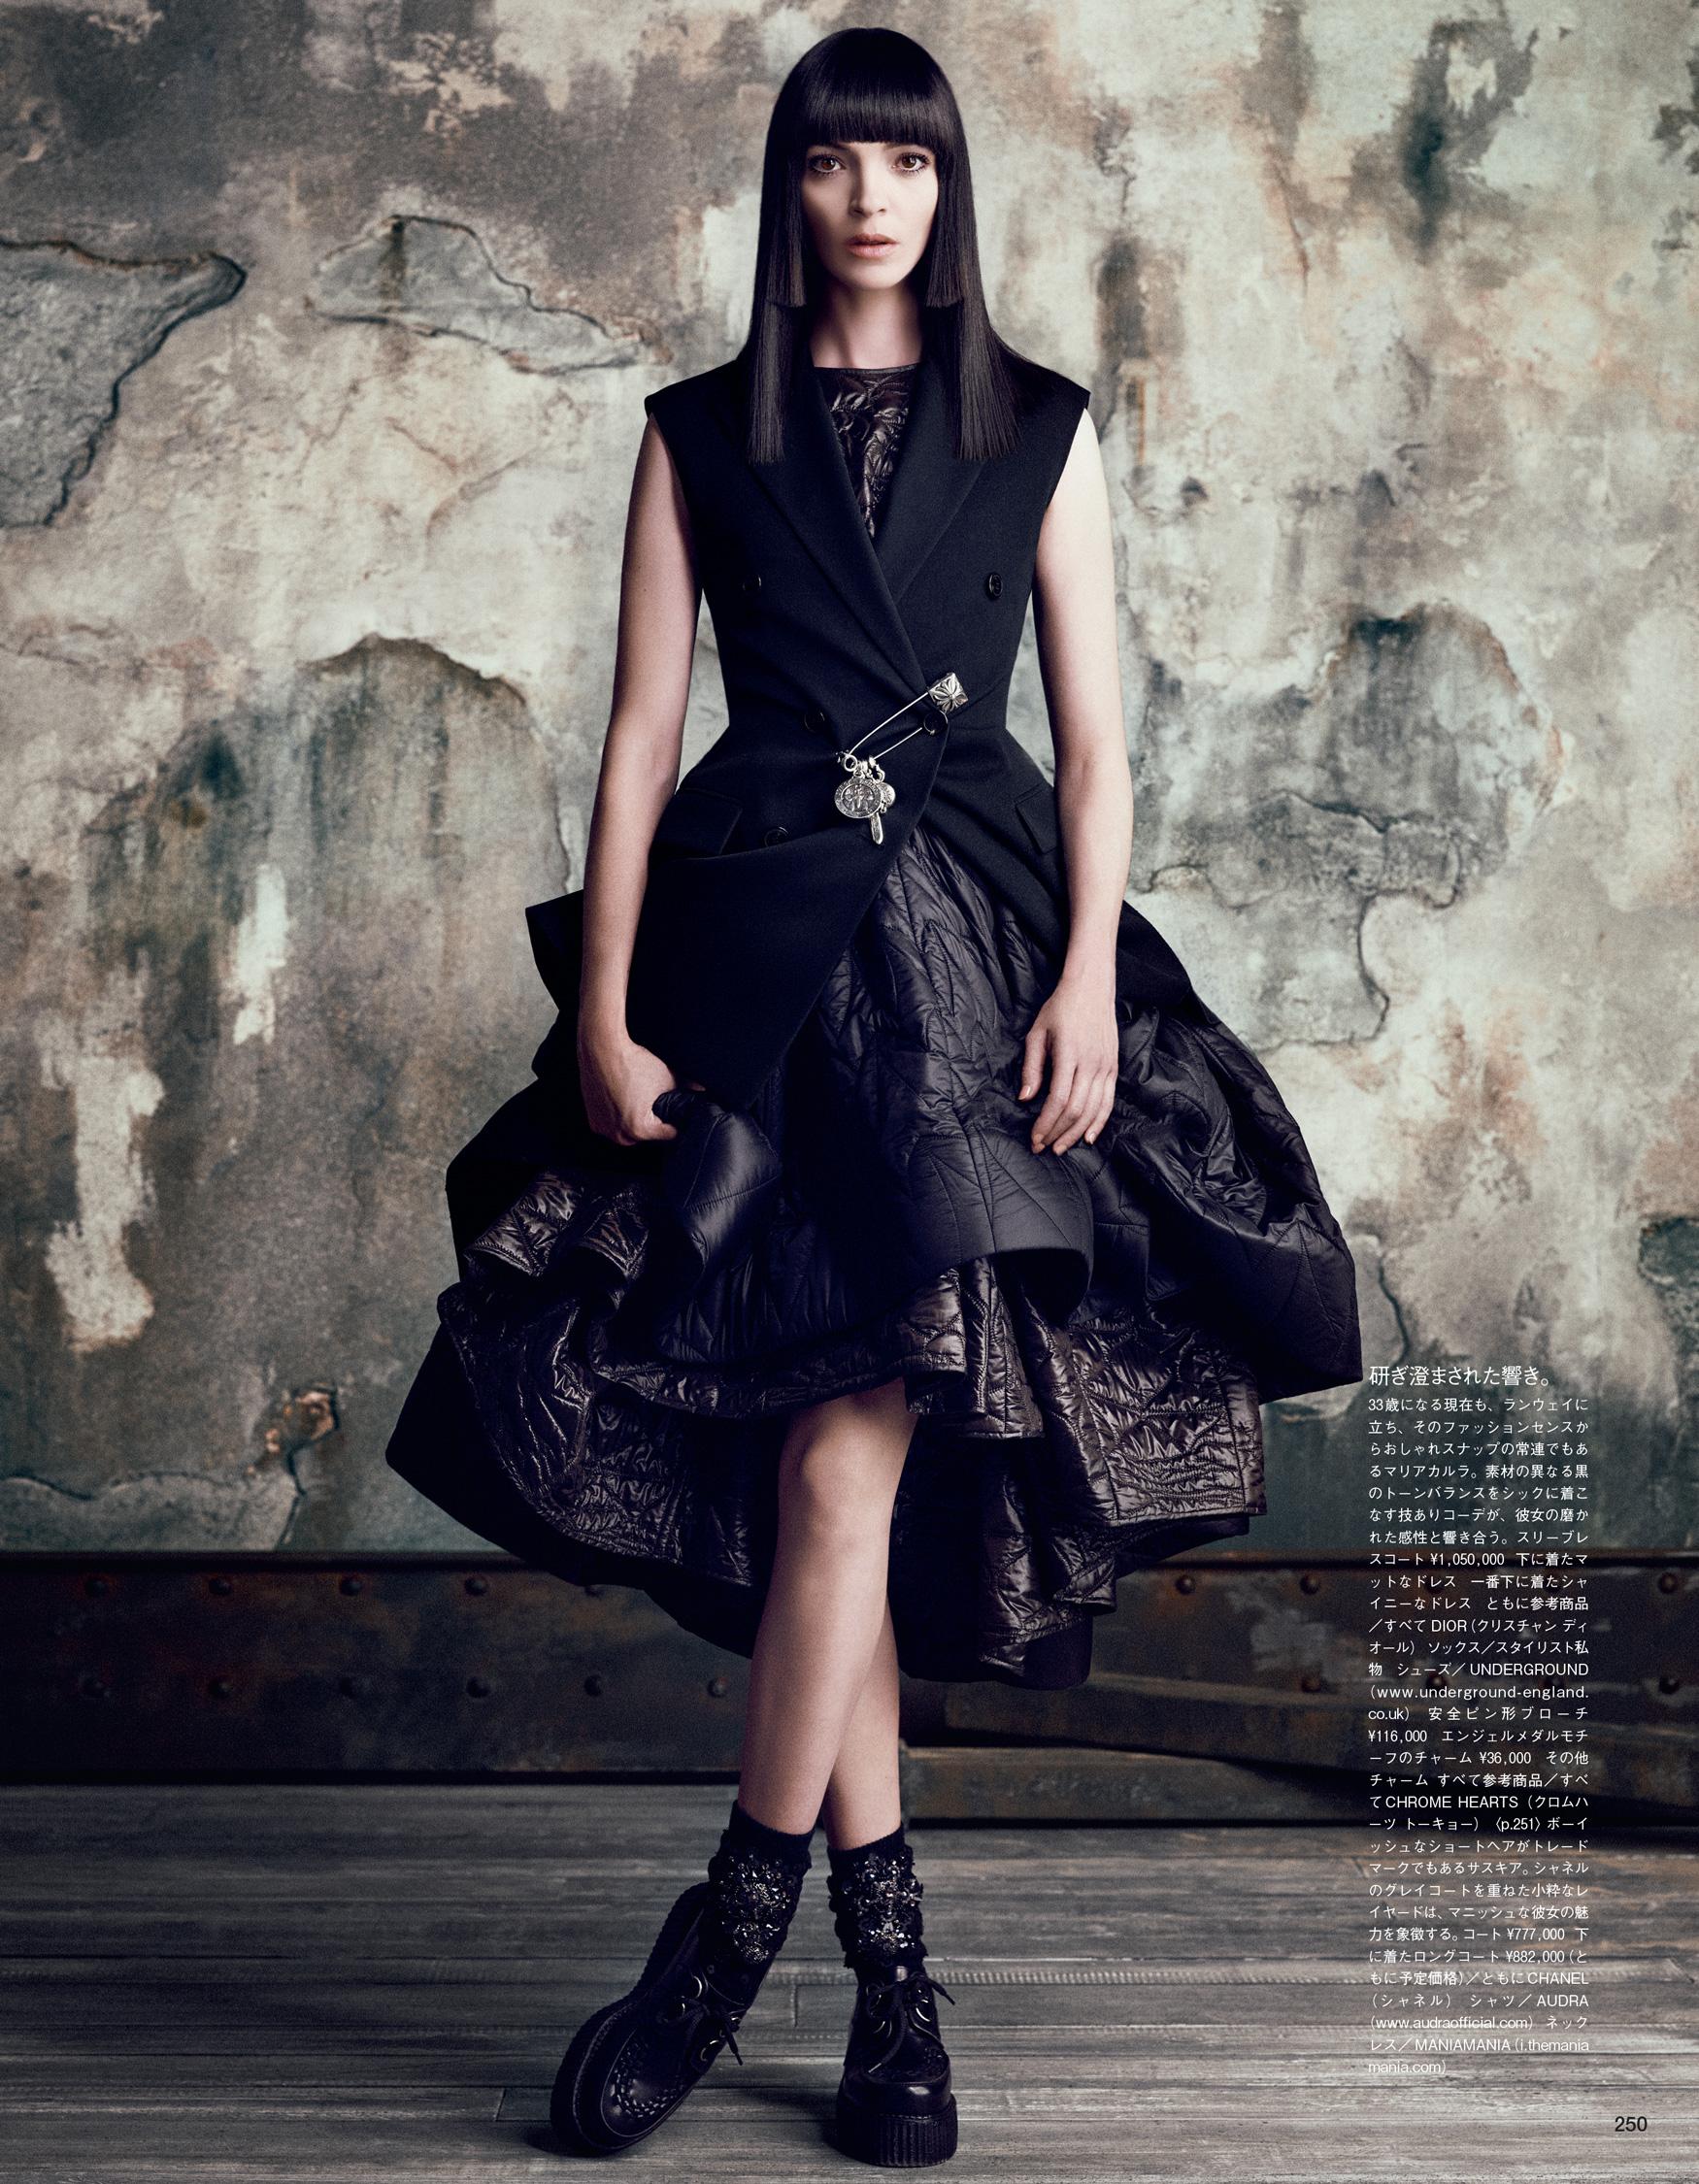 Giovanna-Battaglia-The-Icons-Of-Perfections-Vogue-Japan-15th-Anniversary-Issue-Luigi-Iango-V181_250_200-18.jpg